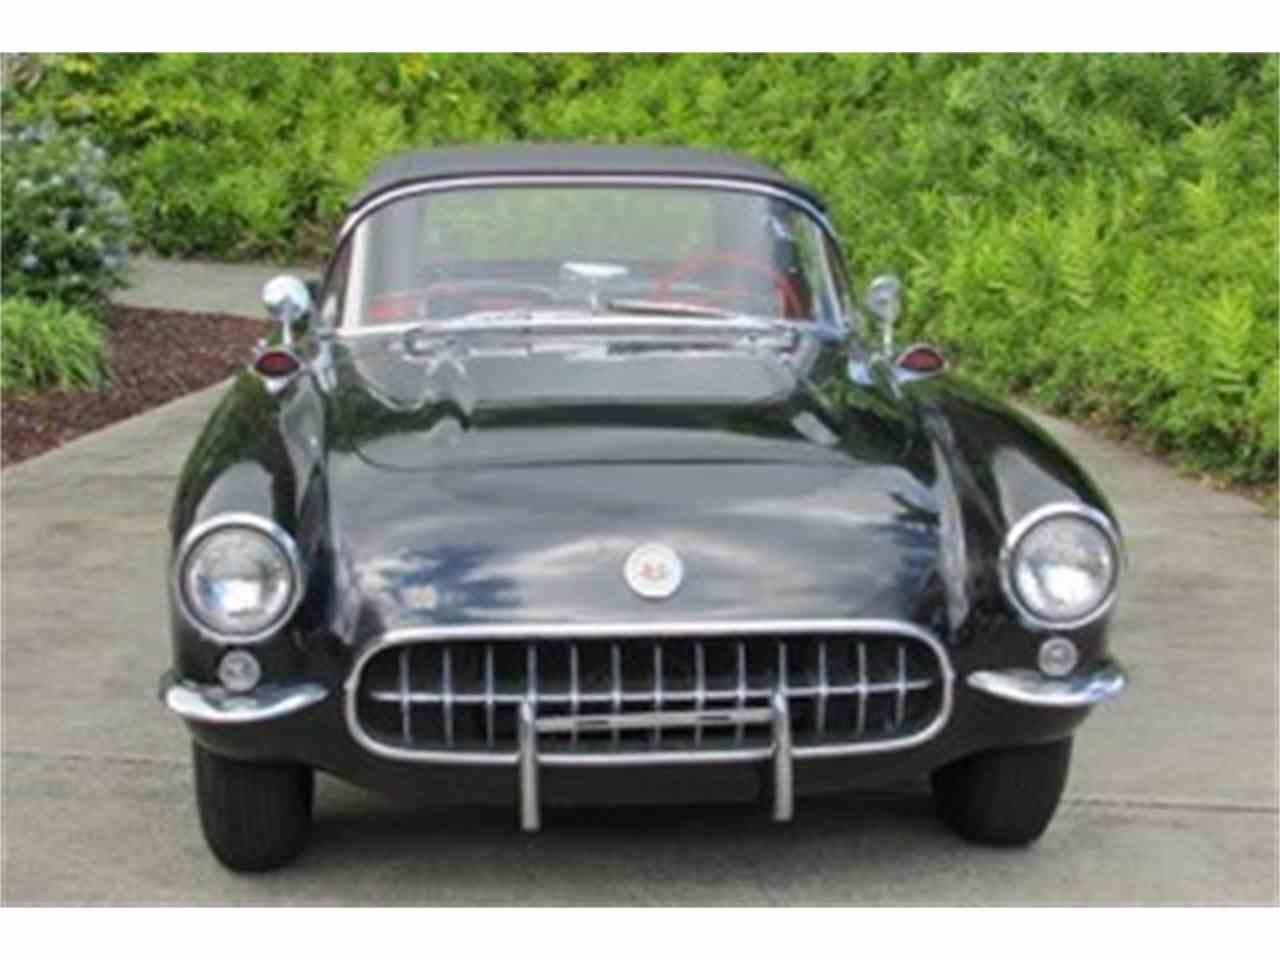 1957 Chevrolet Corvette for Sale | ClassicCars.com | CC-701558